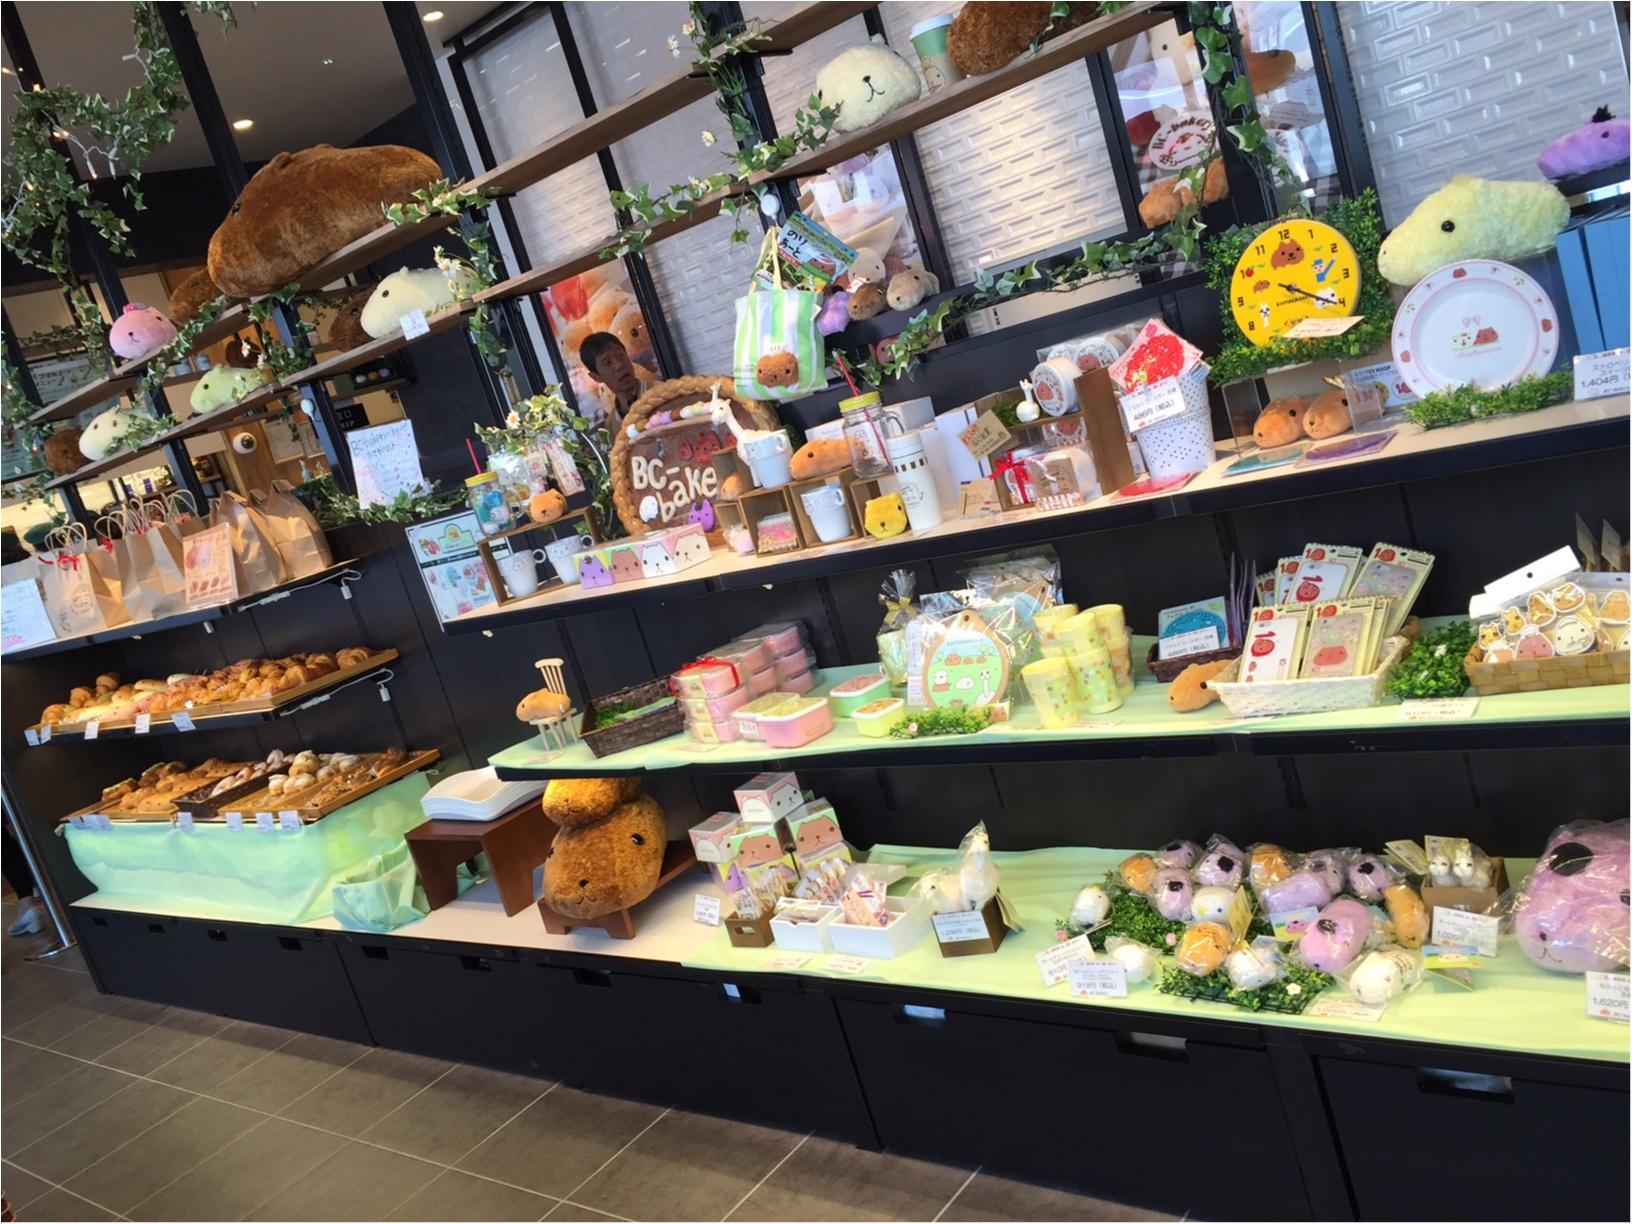 BC-bakery♡カピバラさんパン屋さん_5